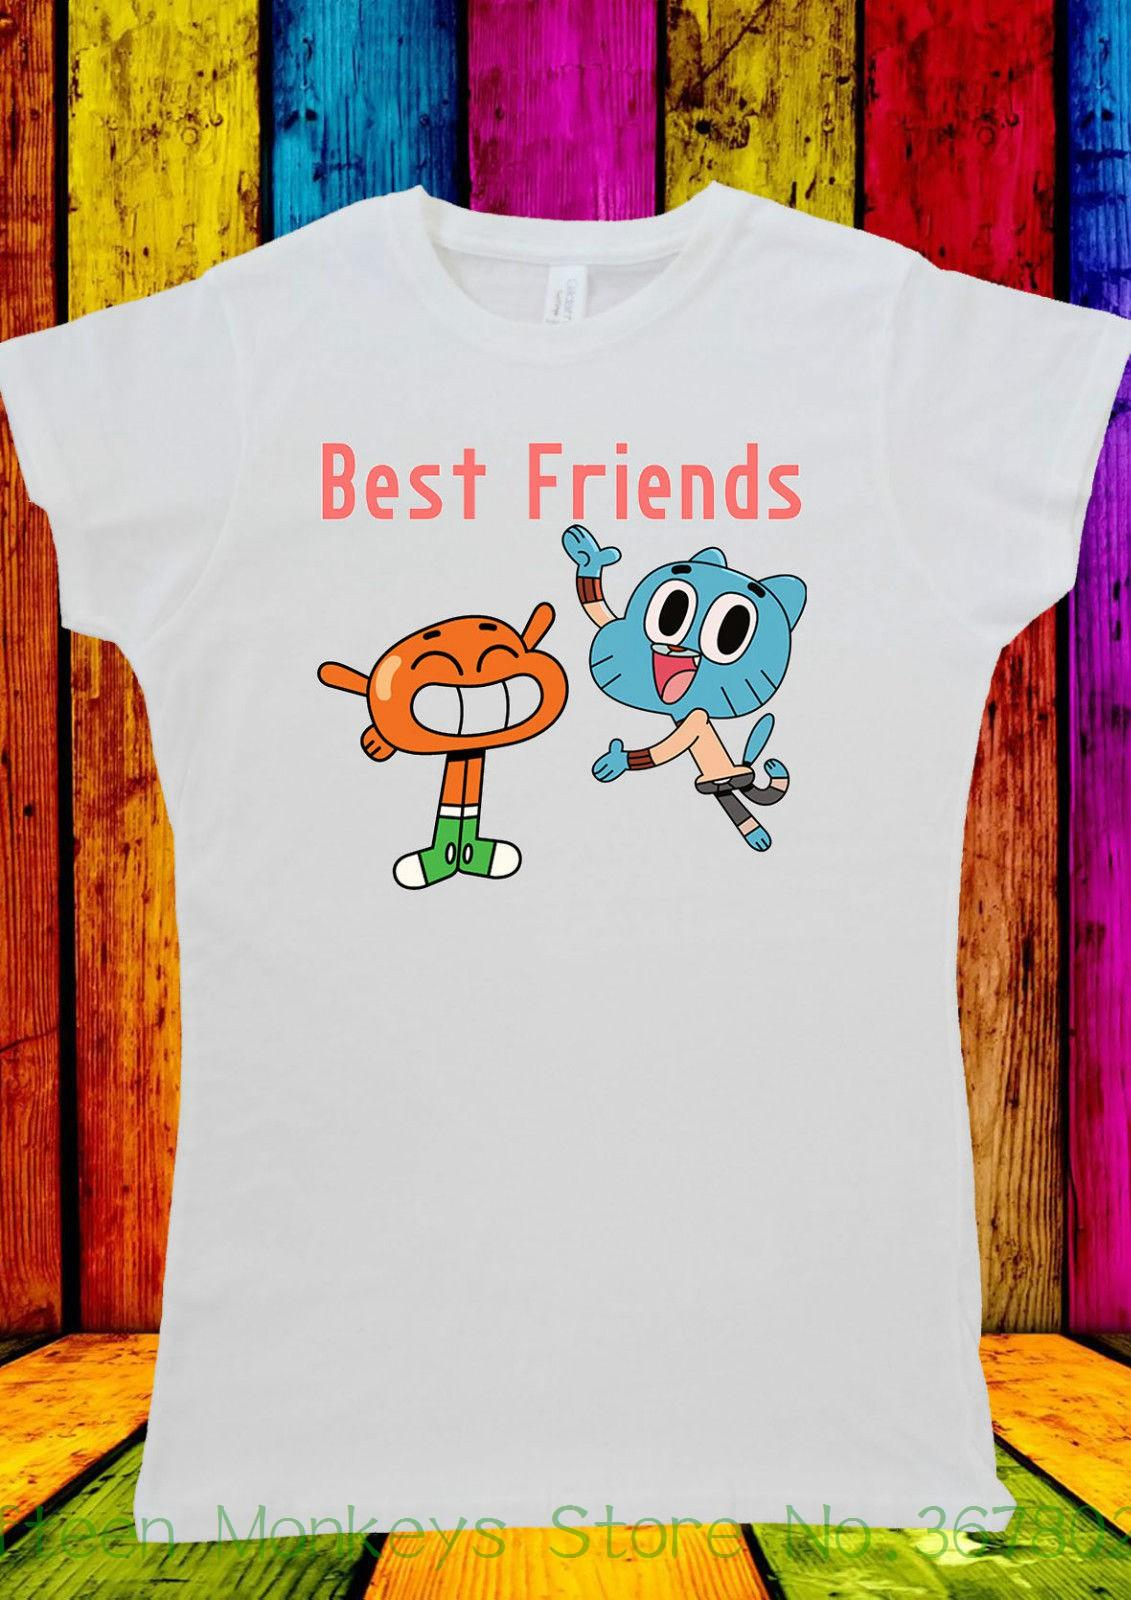 Acquista t shirt da donna best friend cartone animato gumball